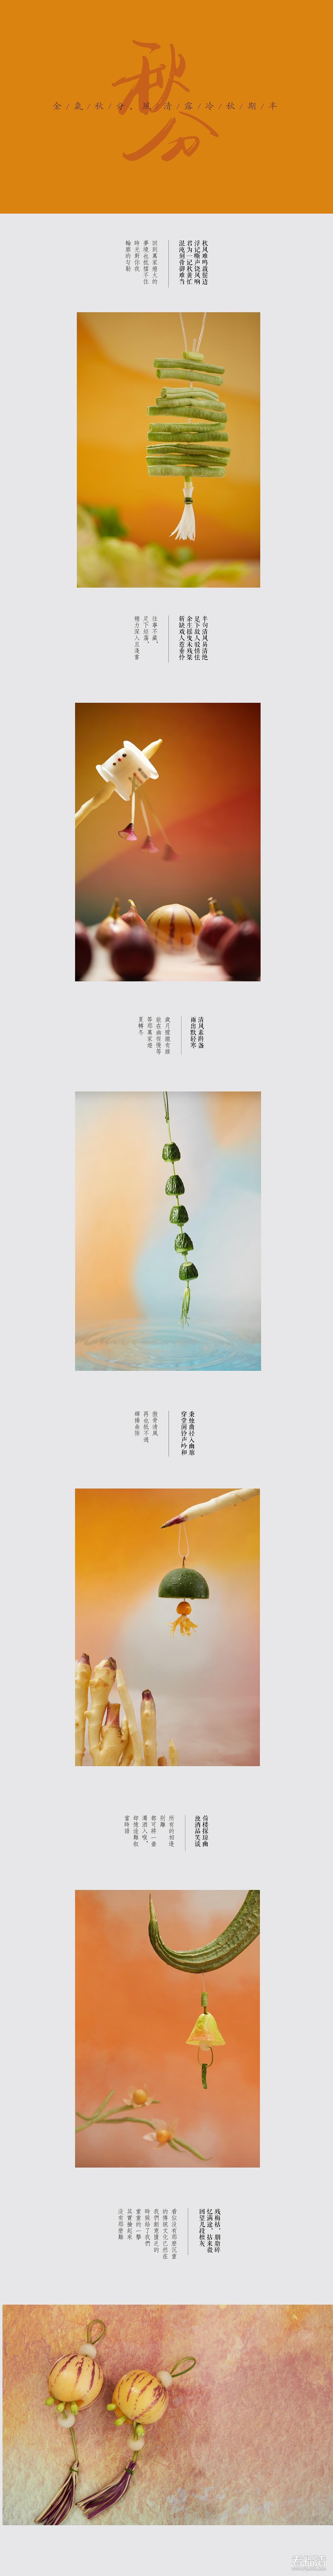 CHINA驰系列 | 廿四节气-秋分